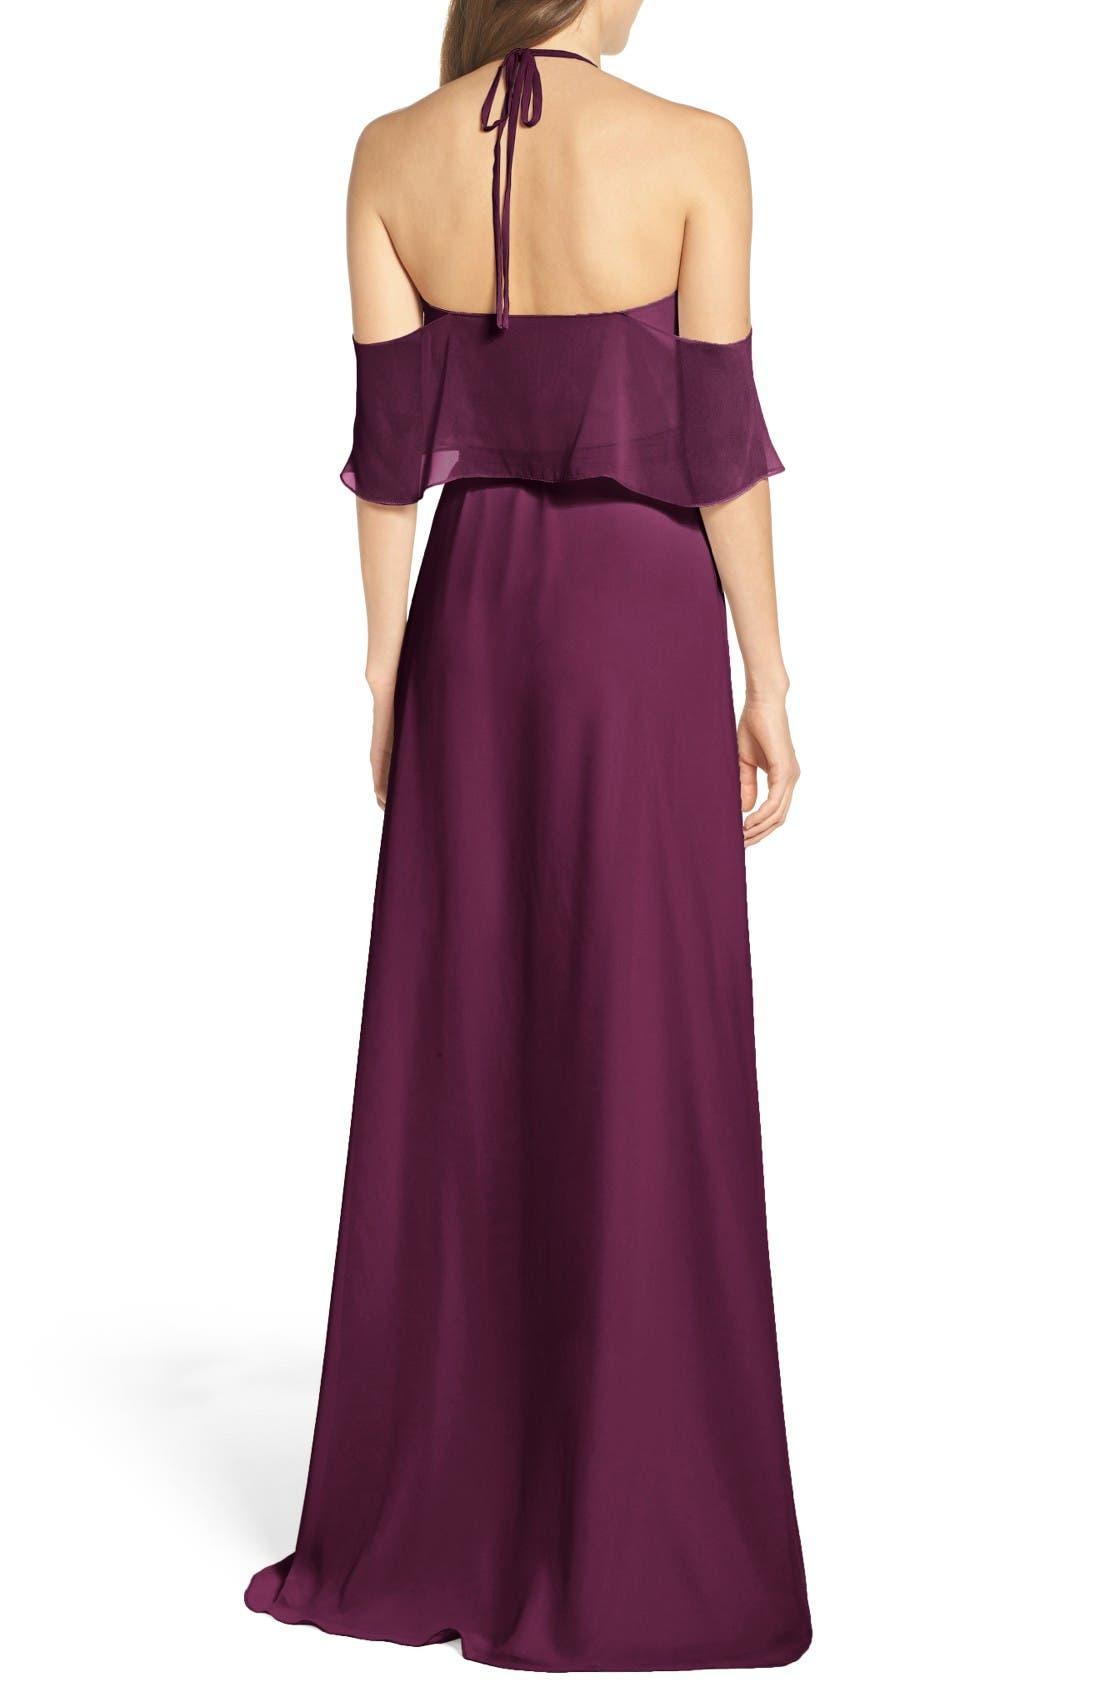 Alternate Image 3  - Ceremony by Joanna August Cold Shoulder Tie Waist Halter Gown